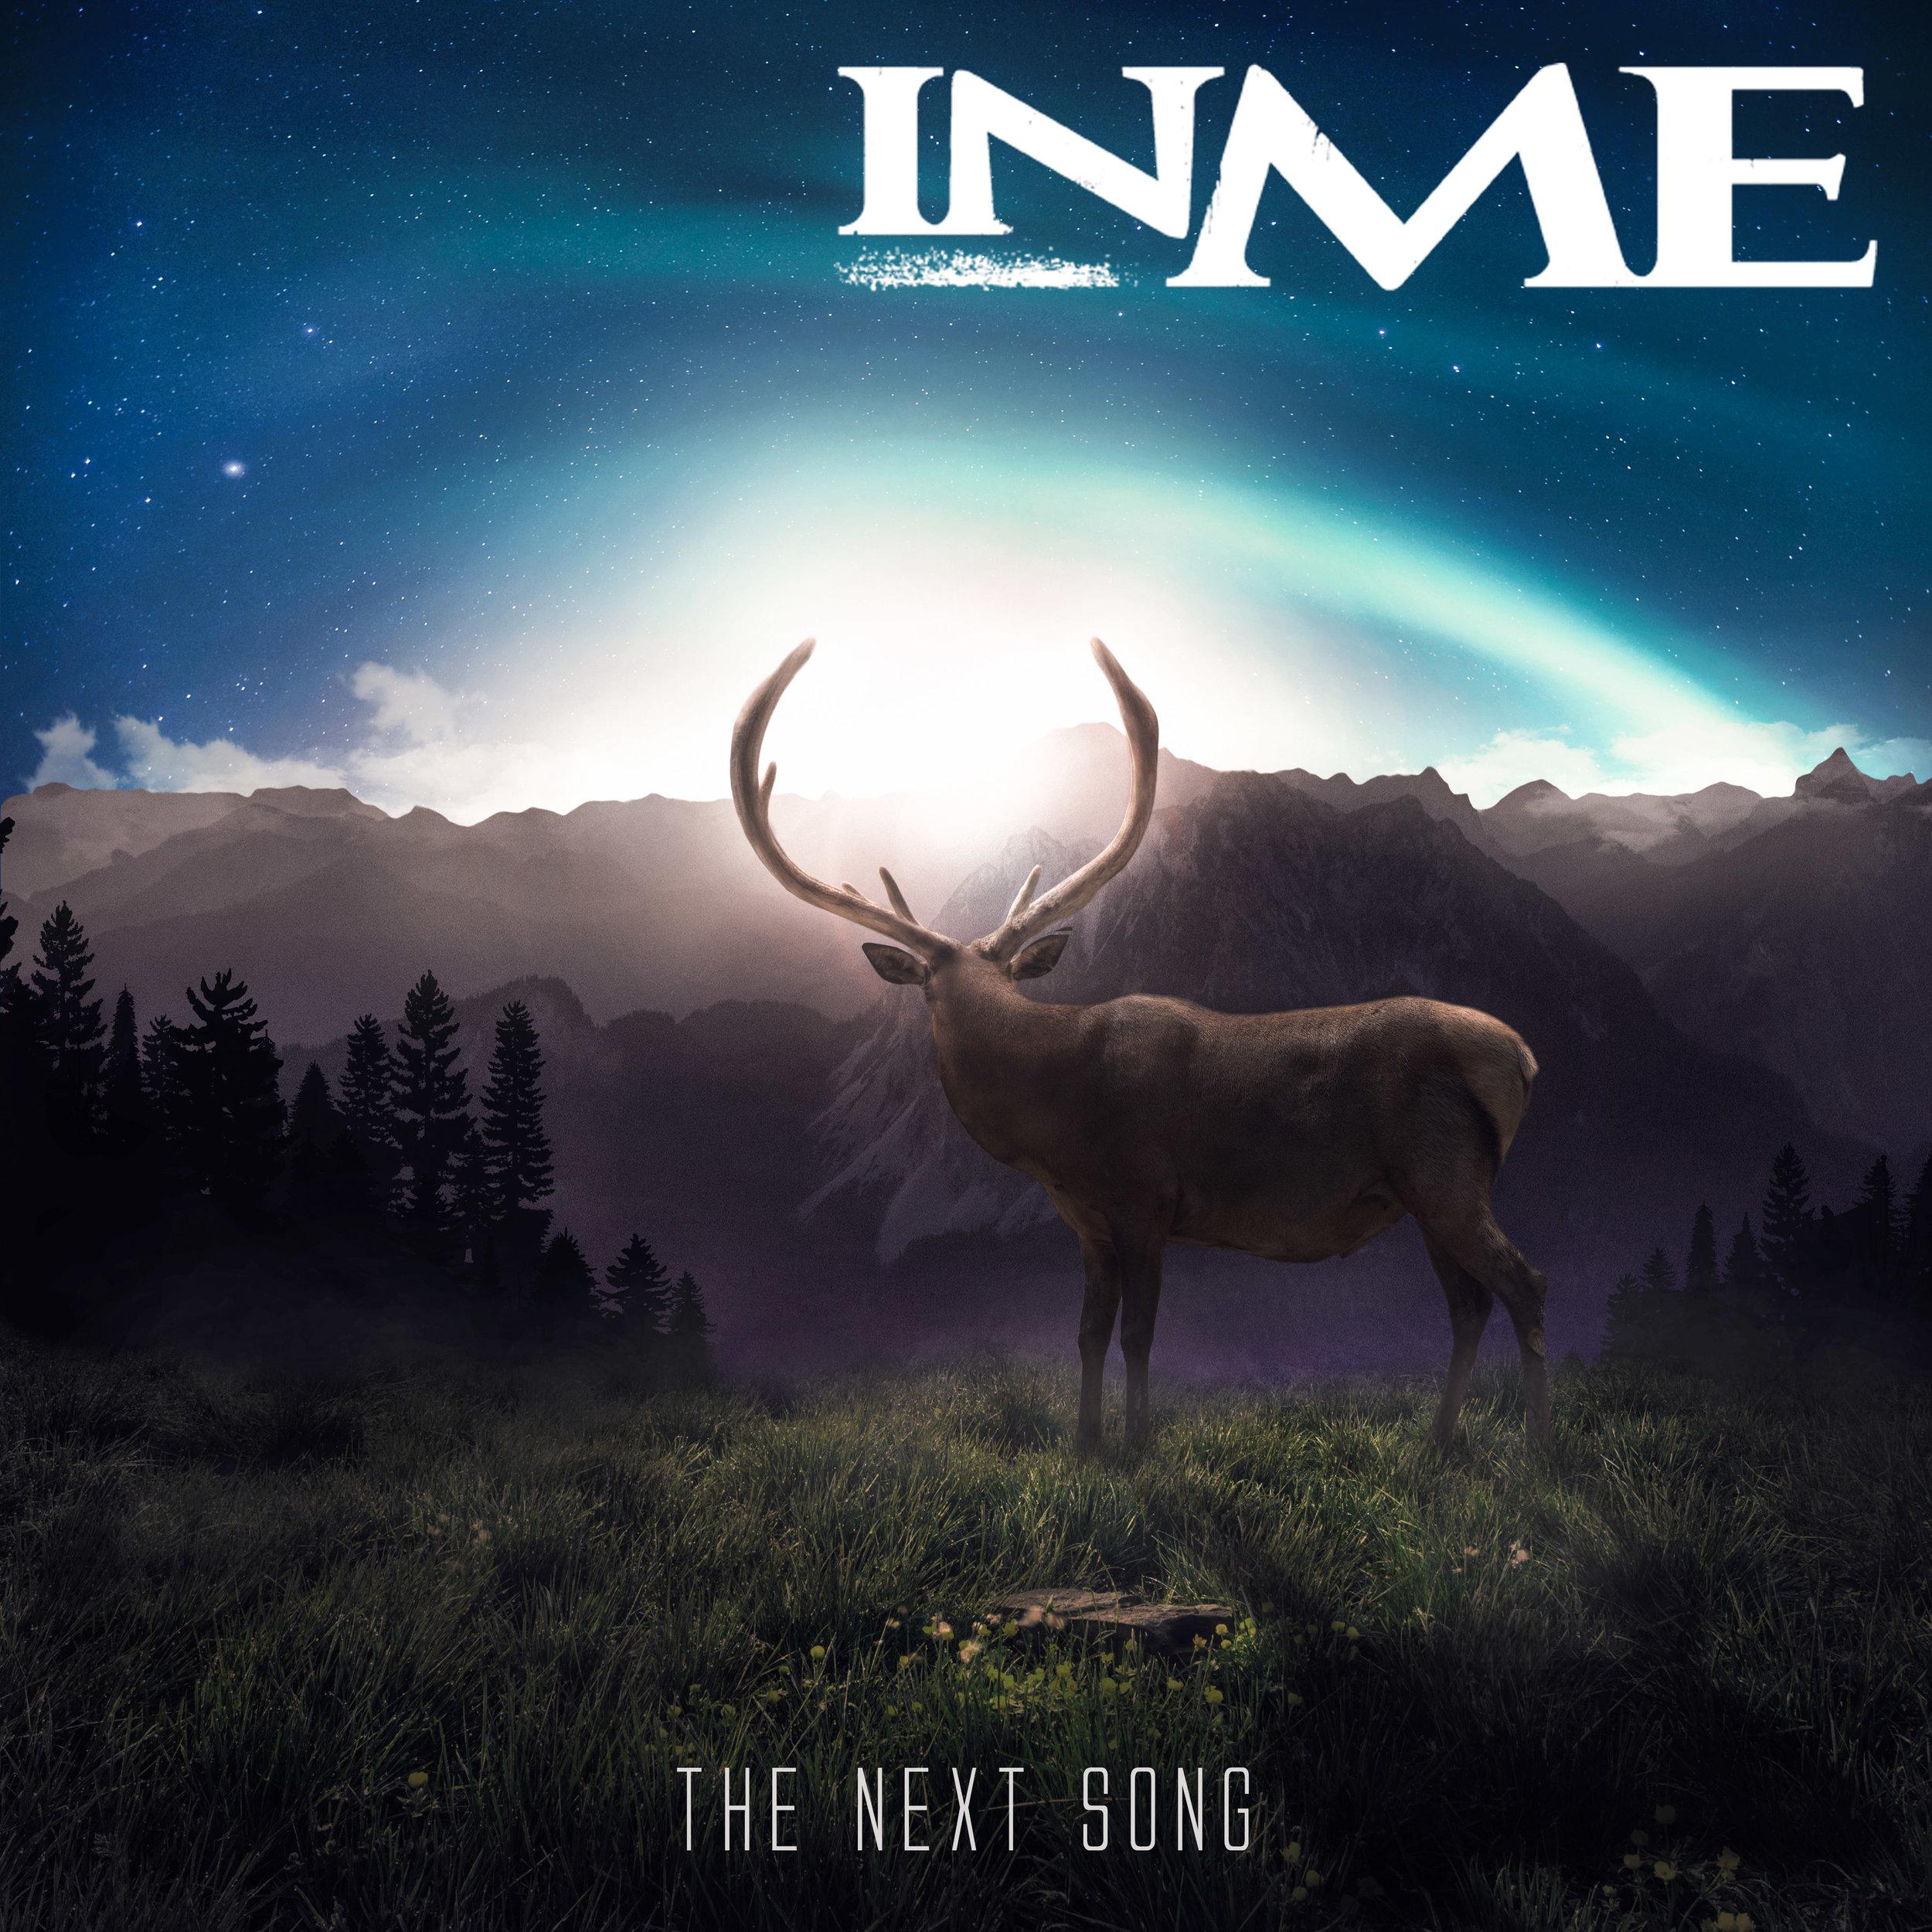 The Next Song - Artwork ©Tom Dalton